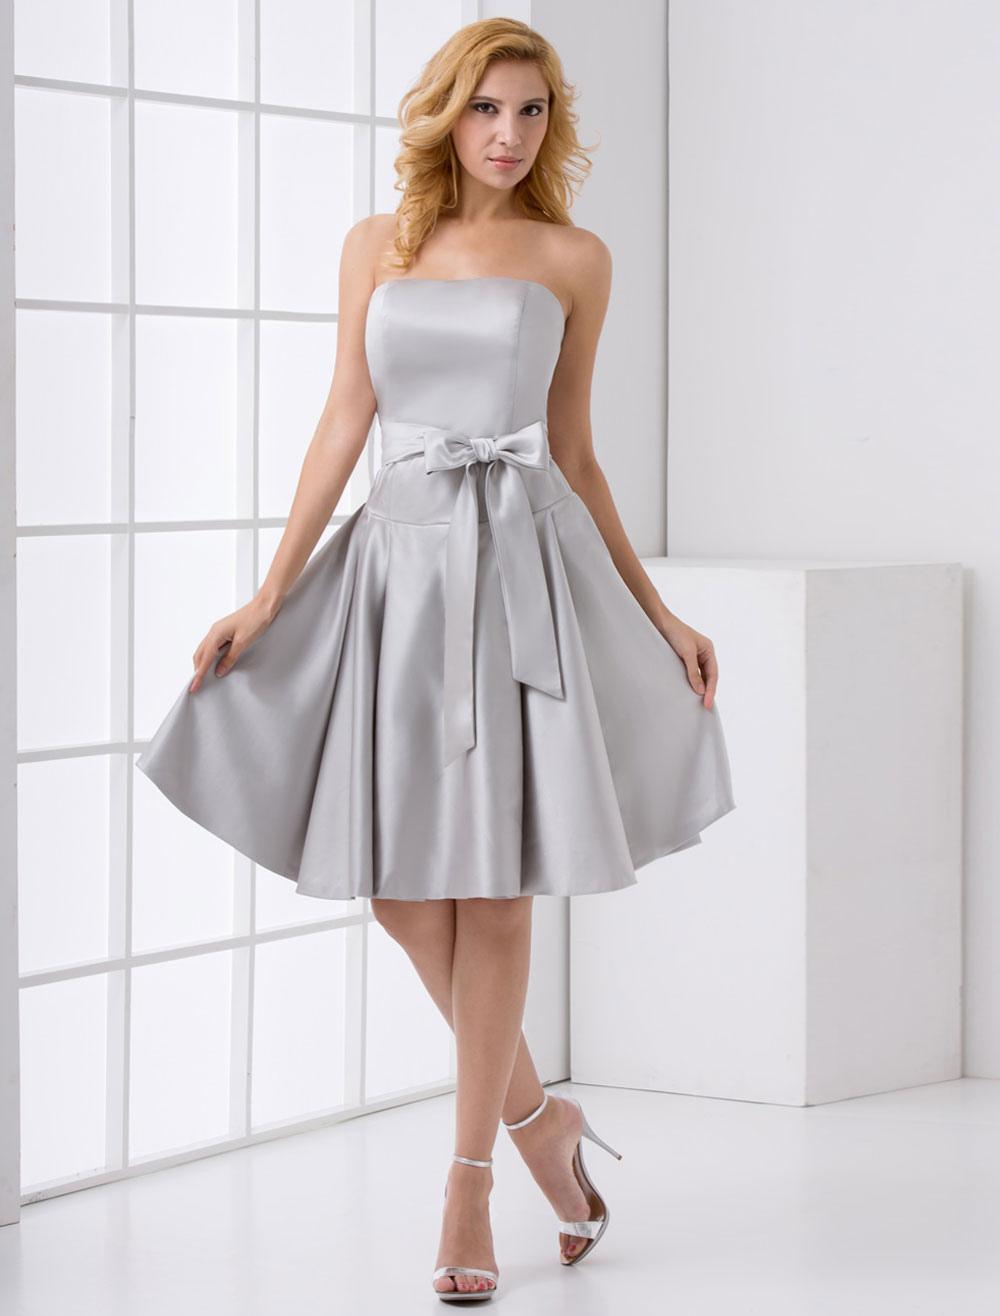 Silver Bridesmaid Dress Short Grey Satin Cocktail Dress With Bow Sash